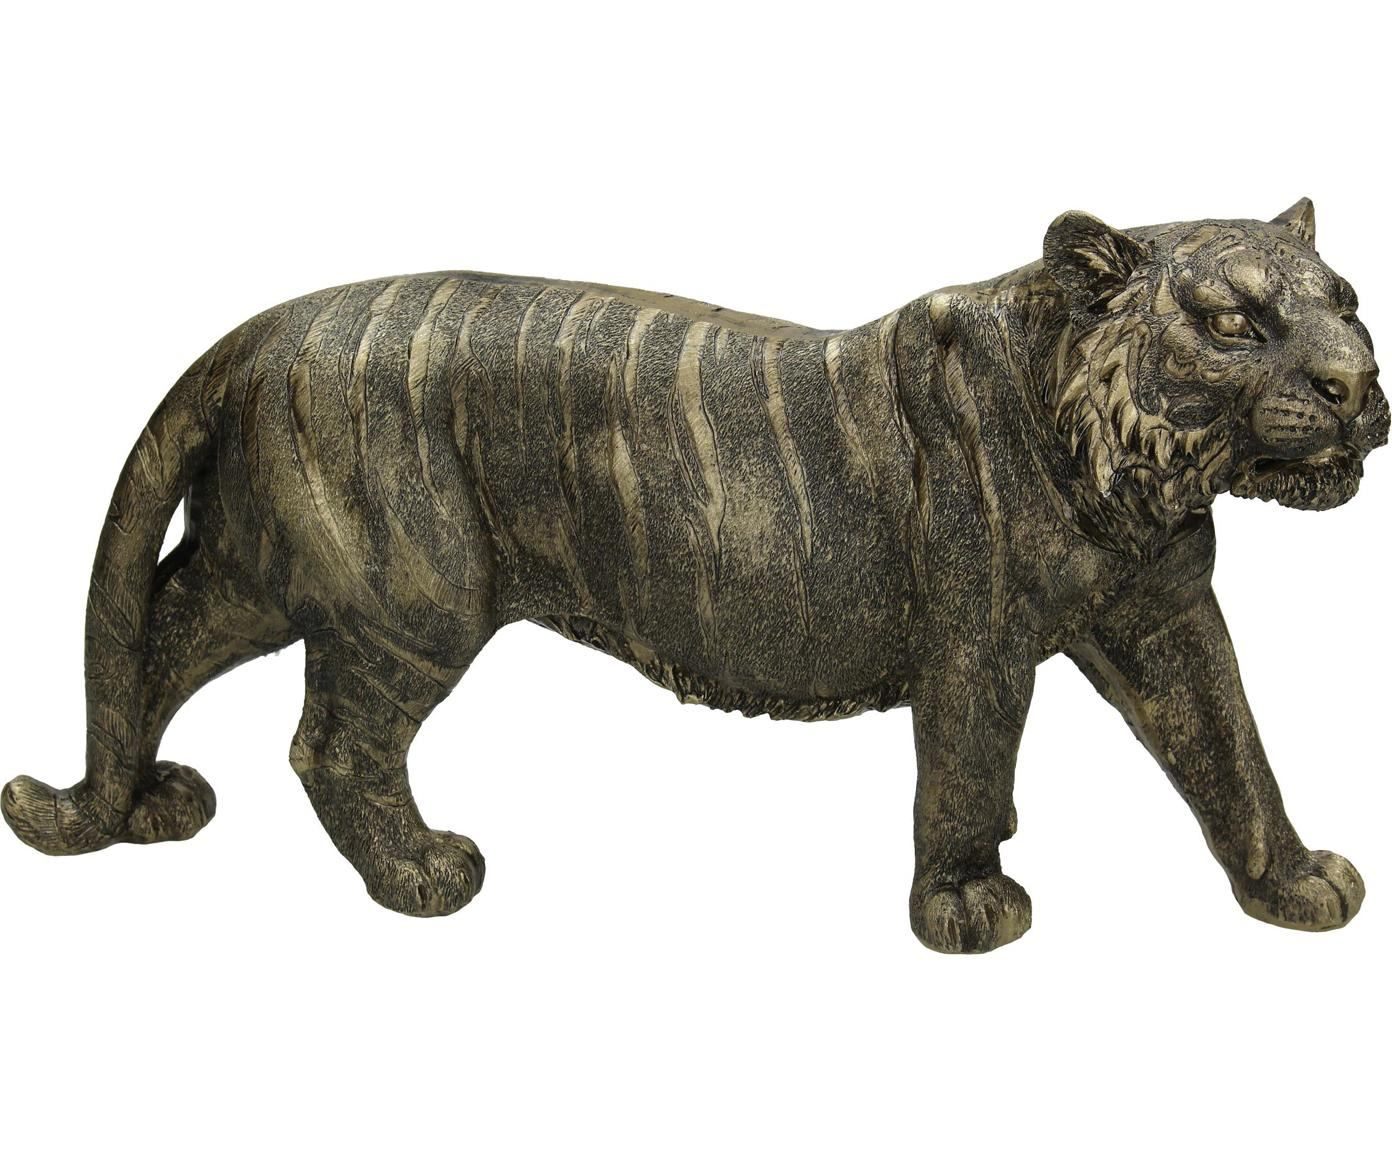 Oggetto decorativo Tiger, Poliresina, Dorato, nero, Larg. 33 x Alt. 18 cm